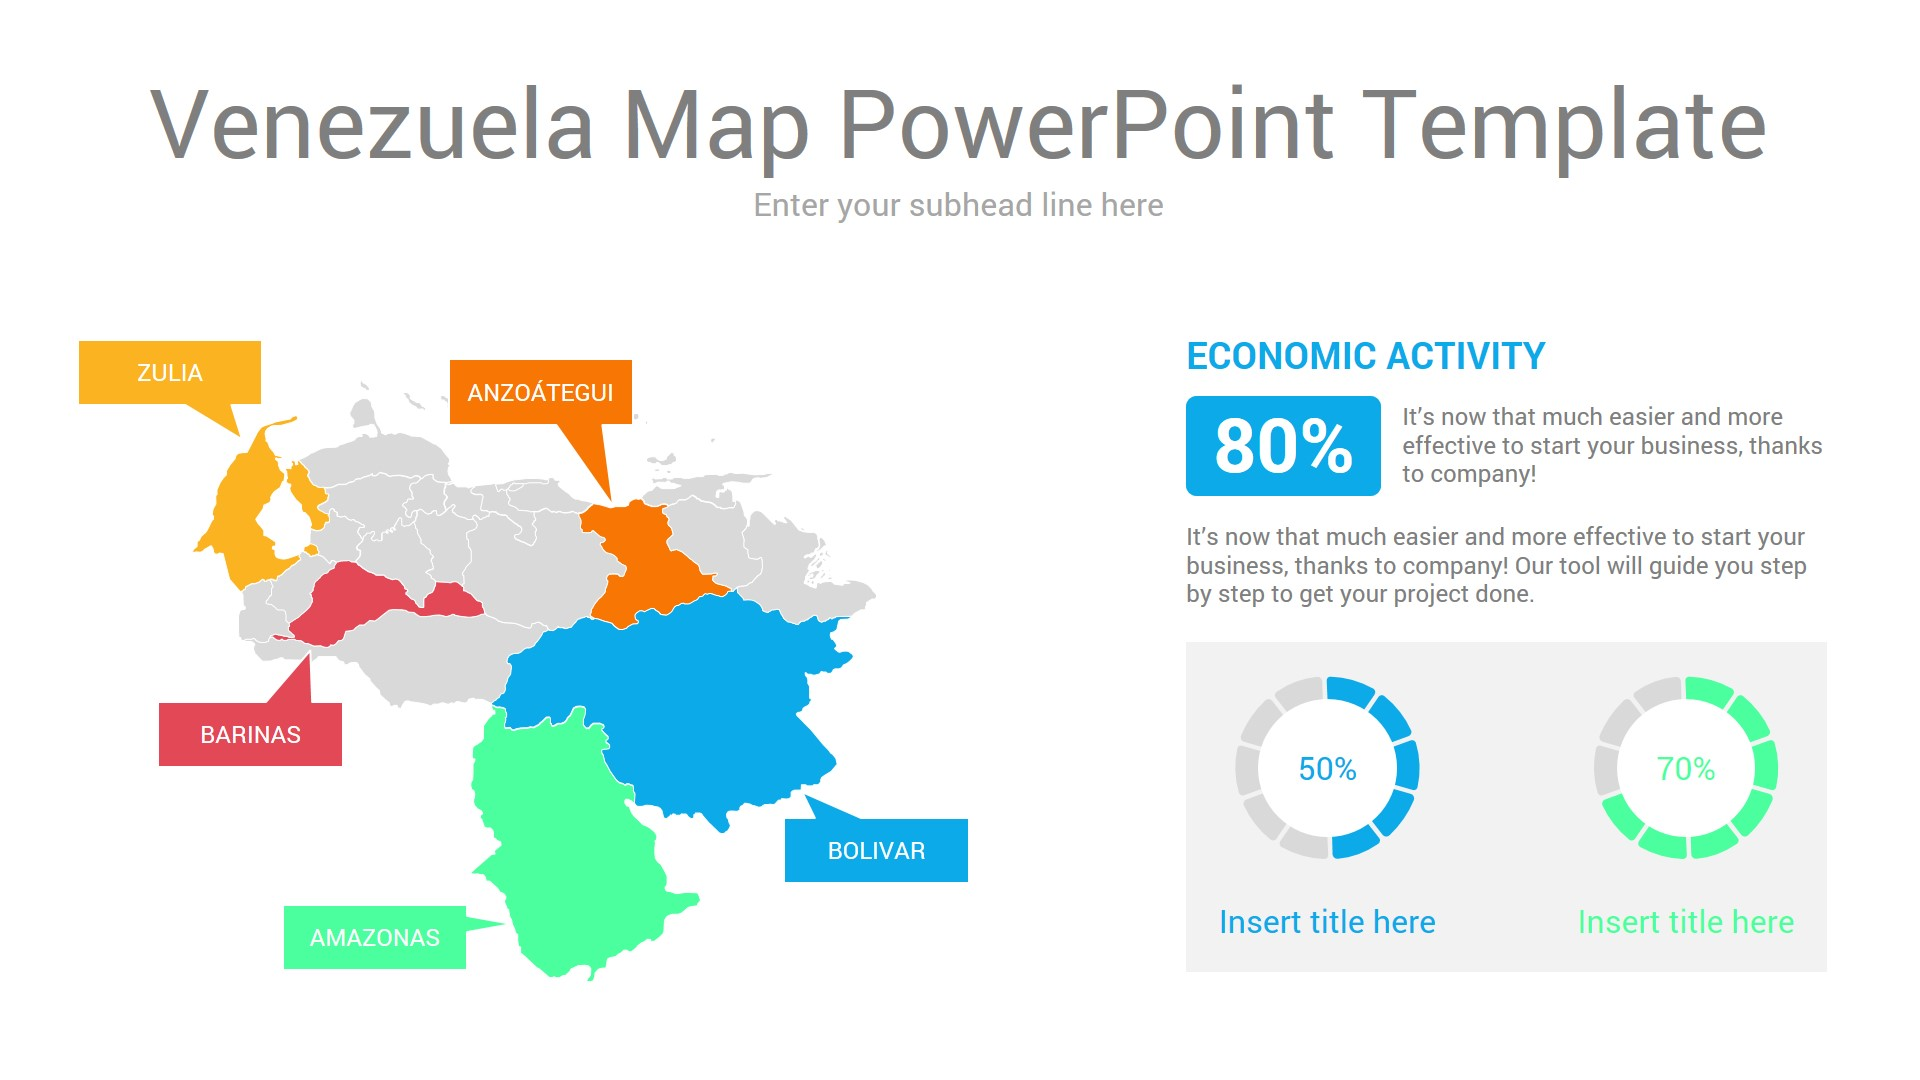 Venezuela map powerpoint template